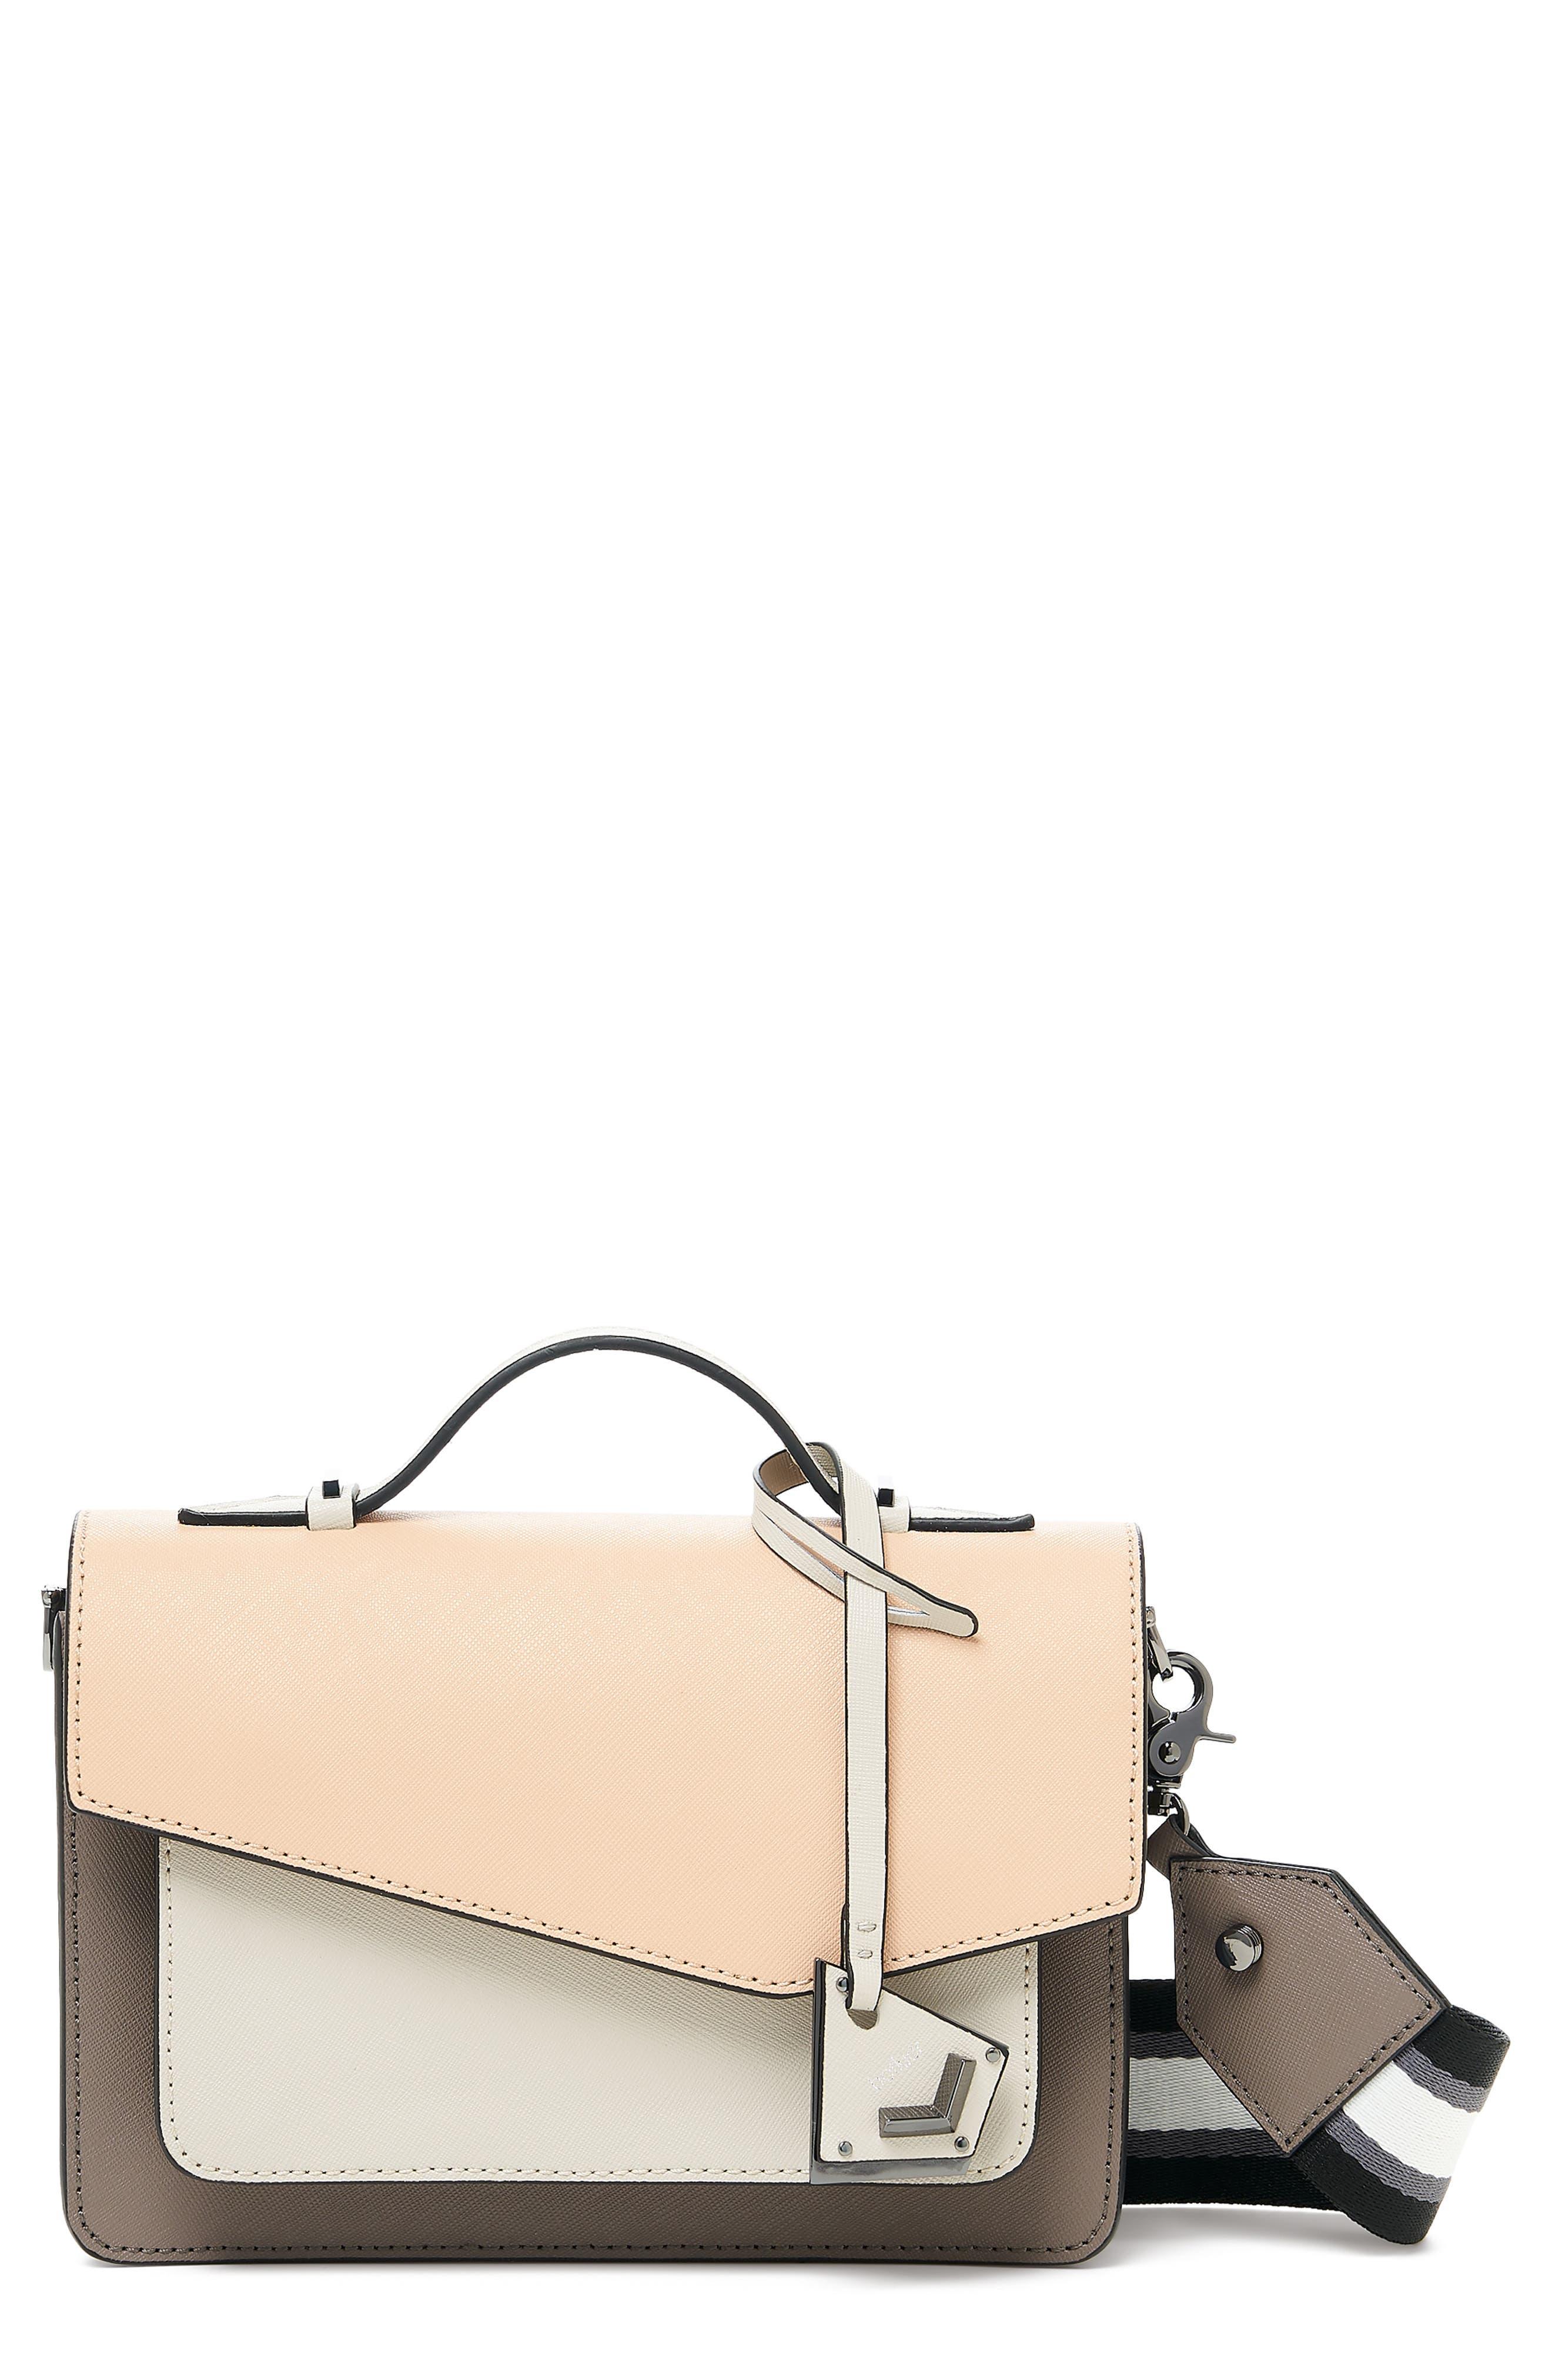 Cobble Hill Calfskin Leather Crossbody Bag,                             Main thumbnail 1, color,                             NUDE COMBO